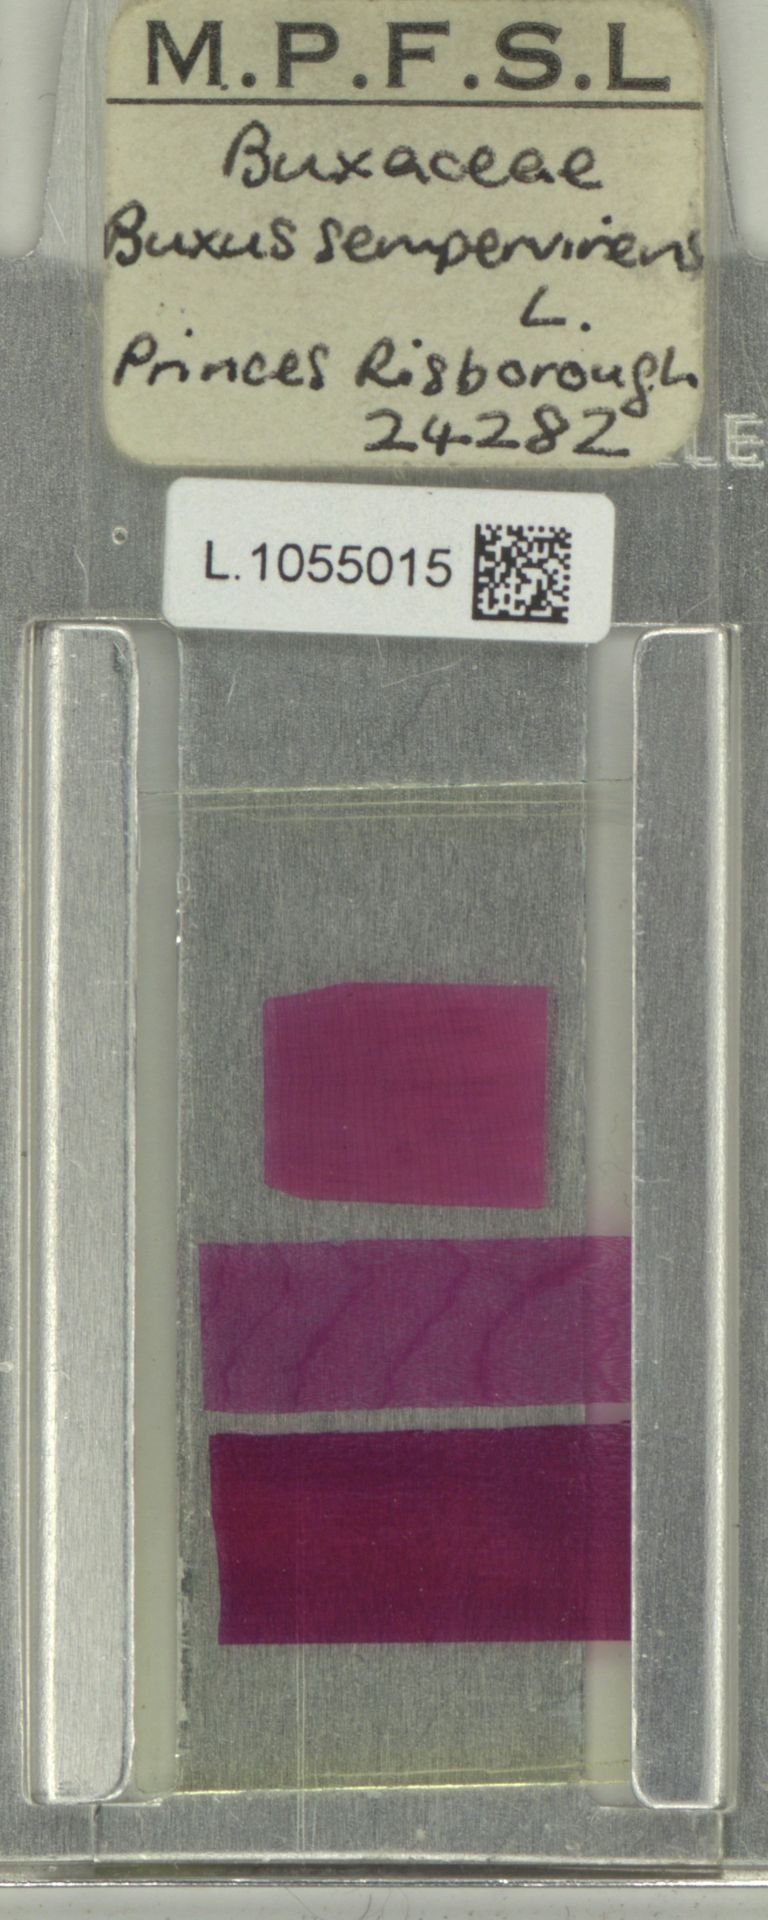 L.1055015 | Buxus sempervirens L.